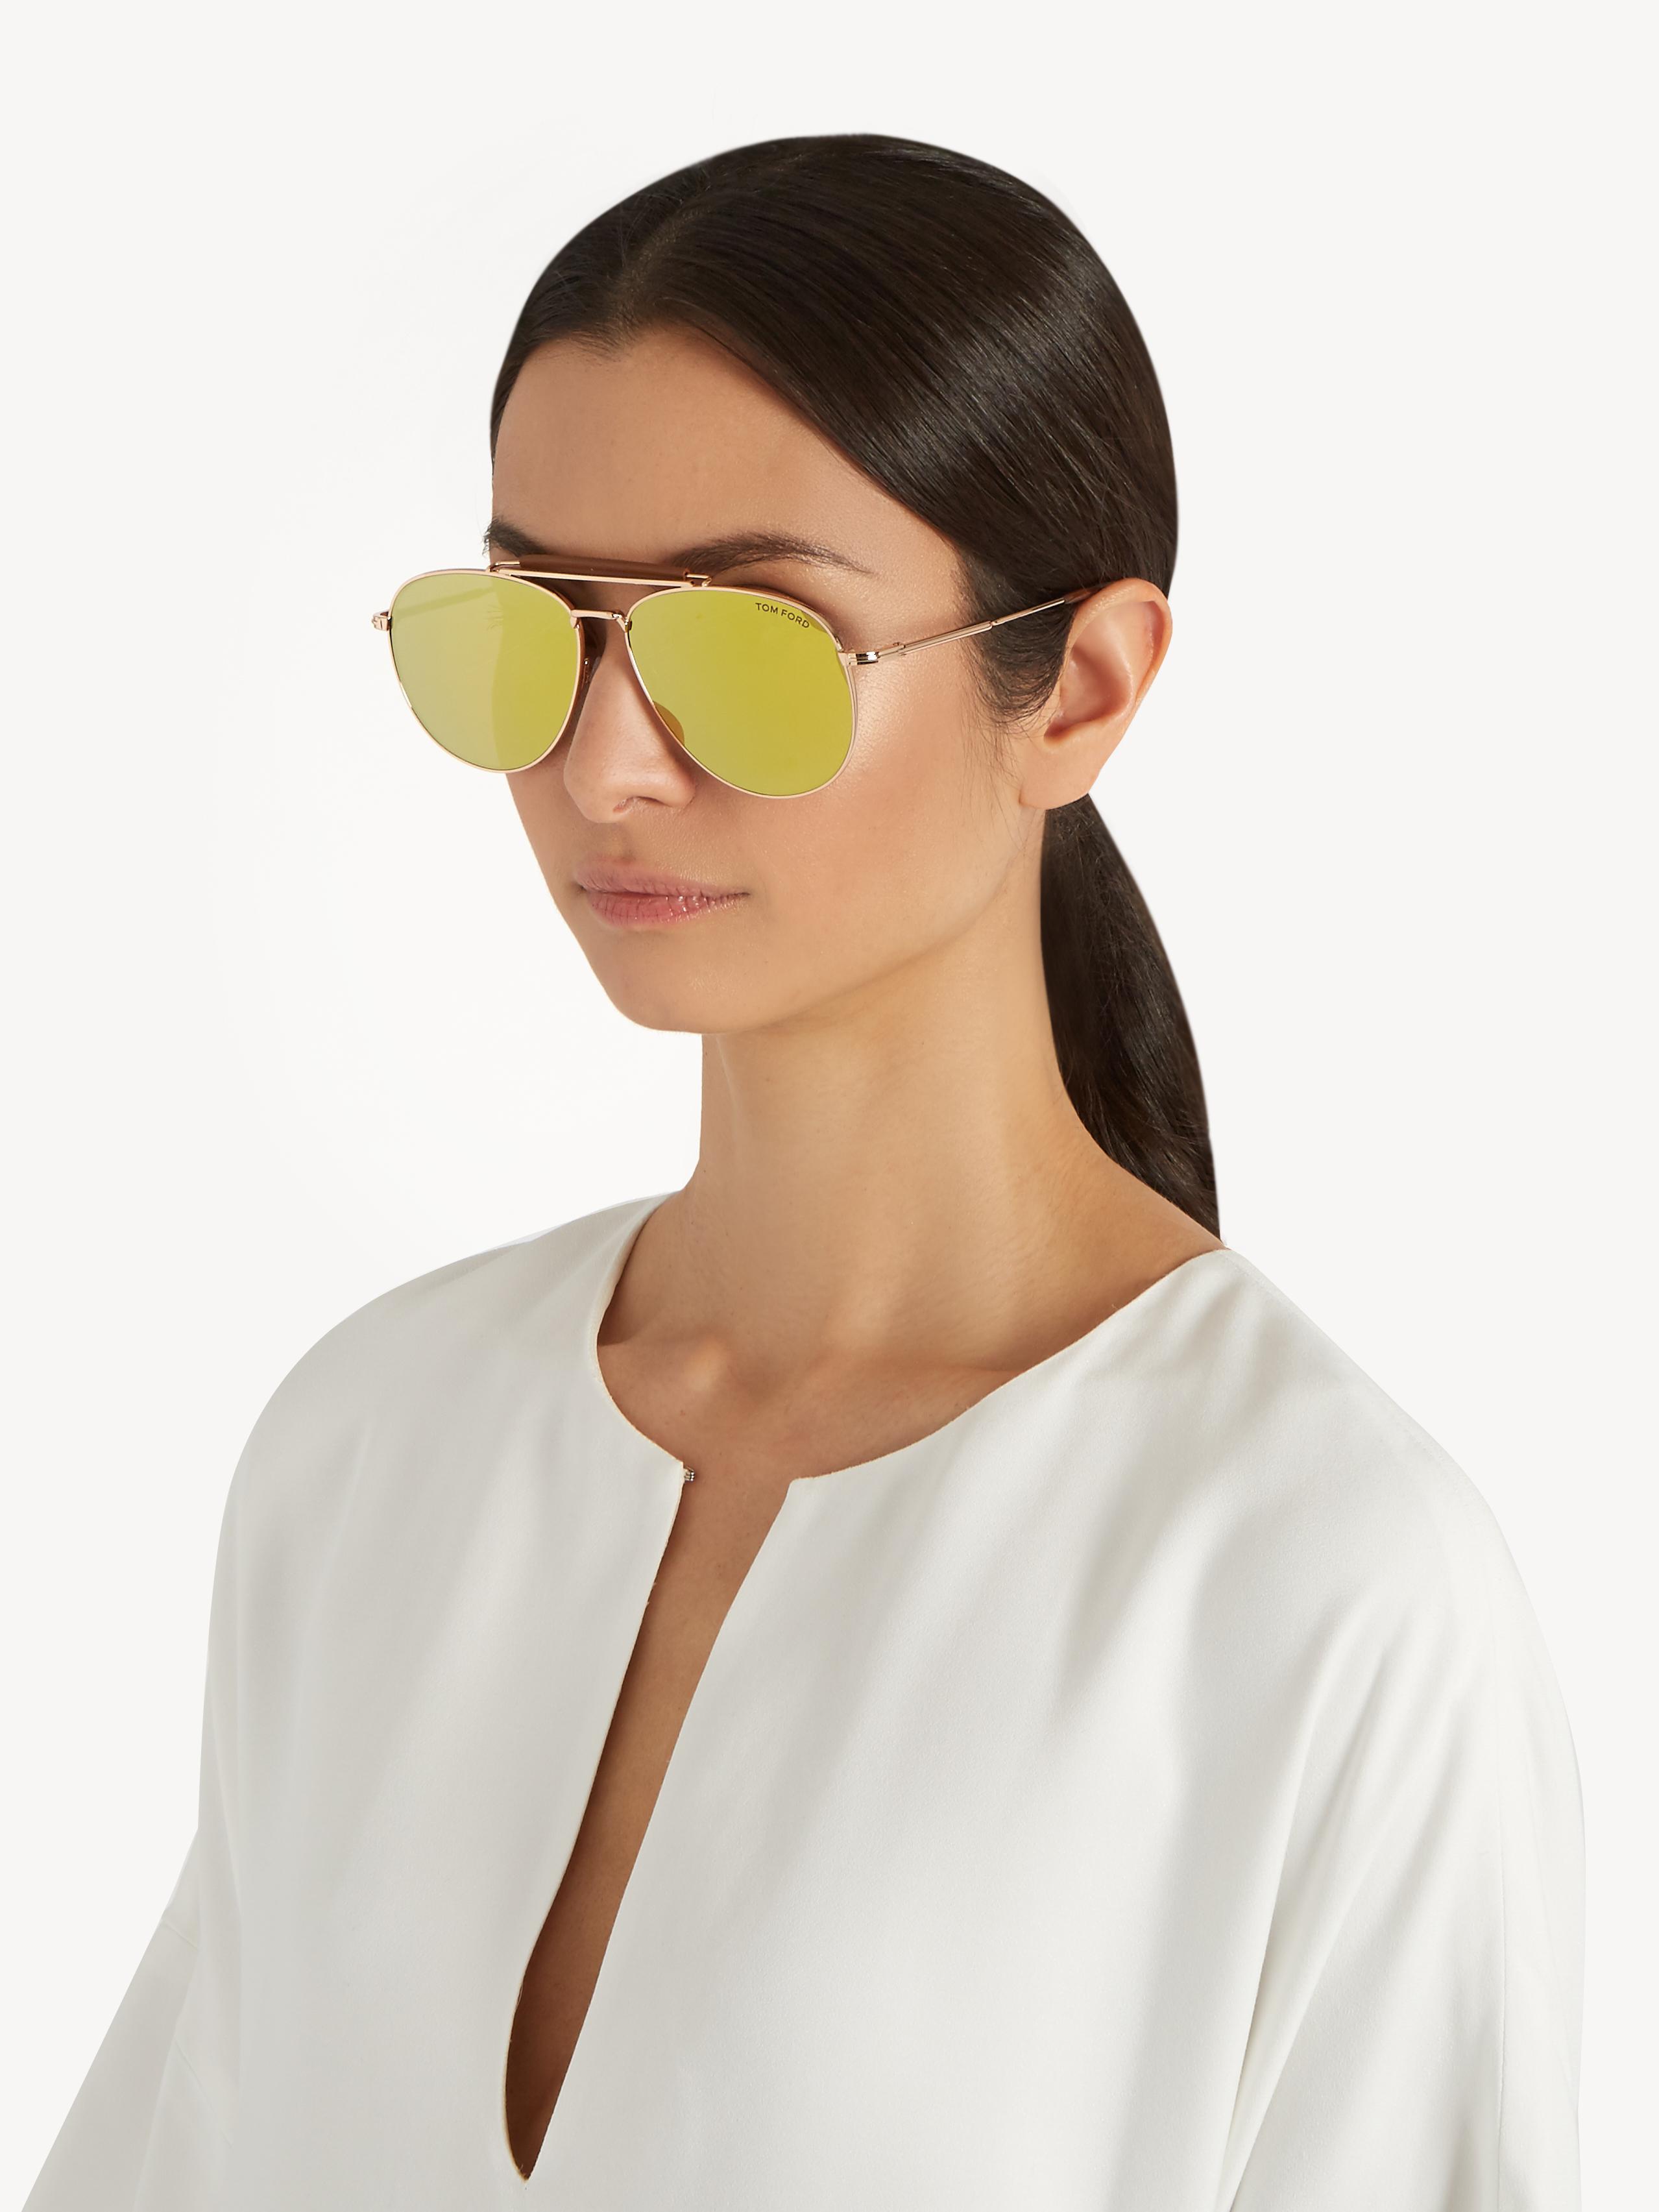 6f38c5e6722ca Lyst - Tom Ford Sean Mirrored Aviator Sunglasses in Metallic